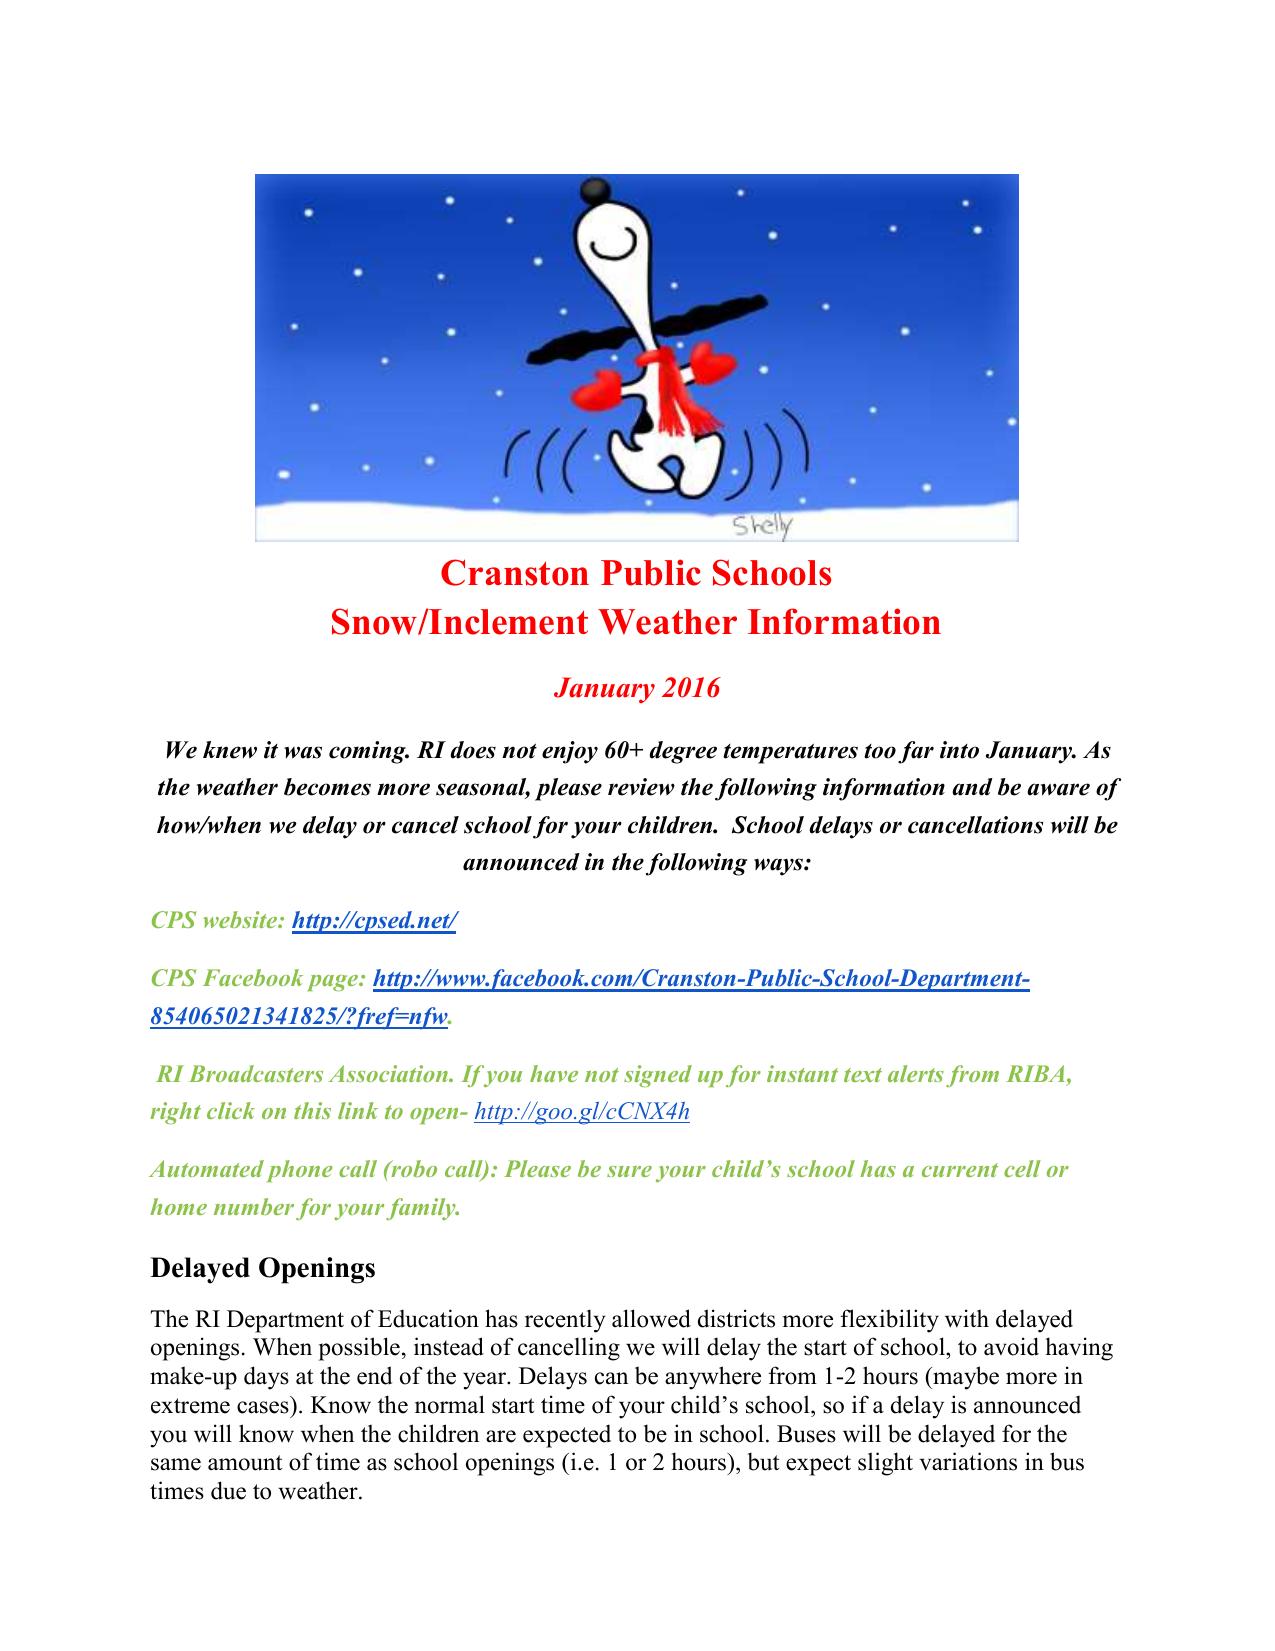 SNOW MEMO - Cranston Public Schools